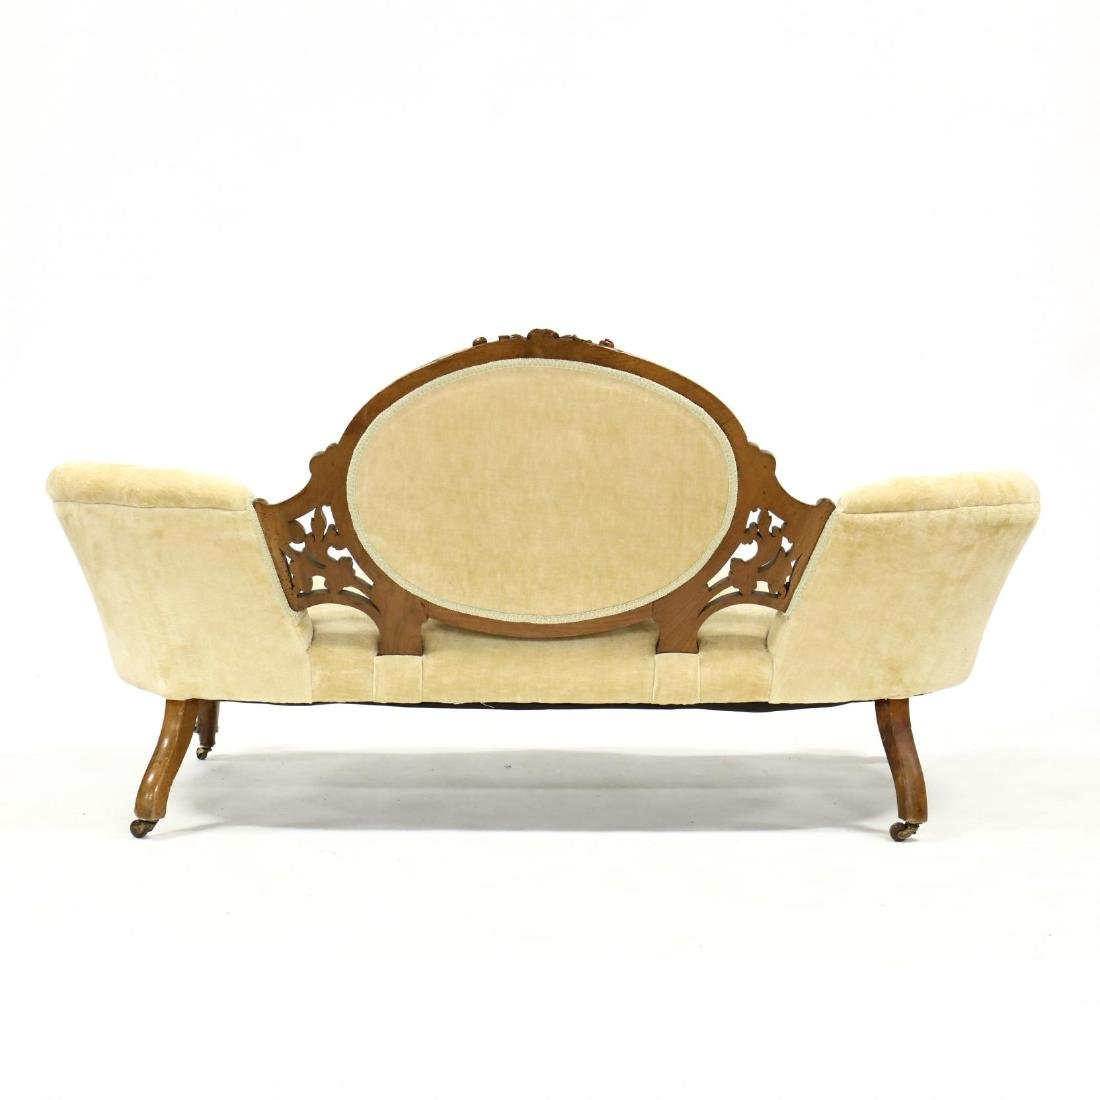 Rococo Revival Victorian Carved Walnut Sofa - 4